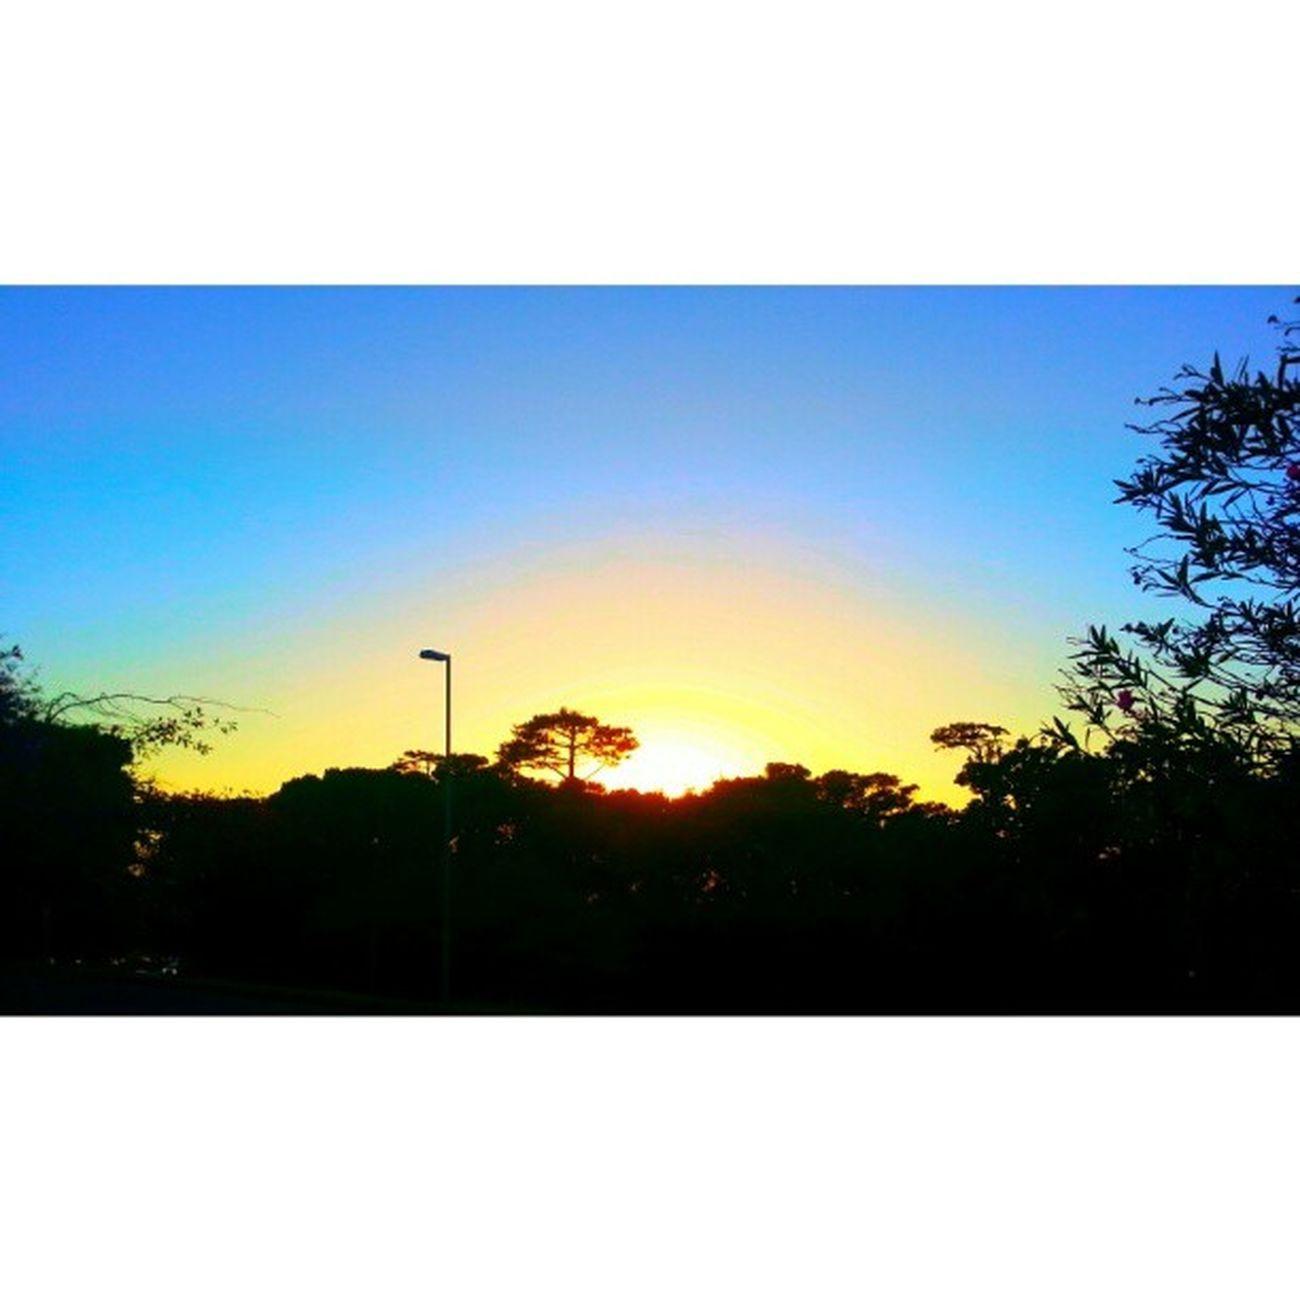 Sunupper Sun Sunrays Morning winter